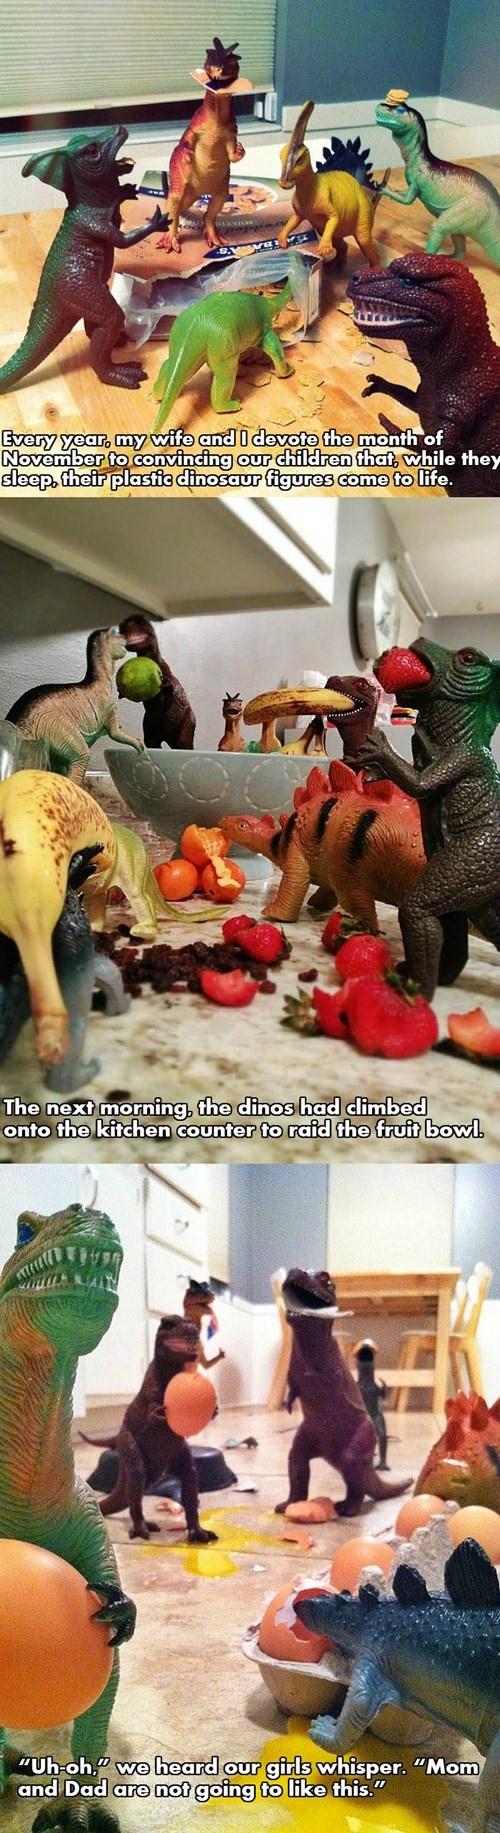 cute dinosaurs funny parenting prank - 7902381568